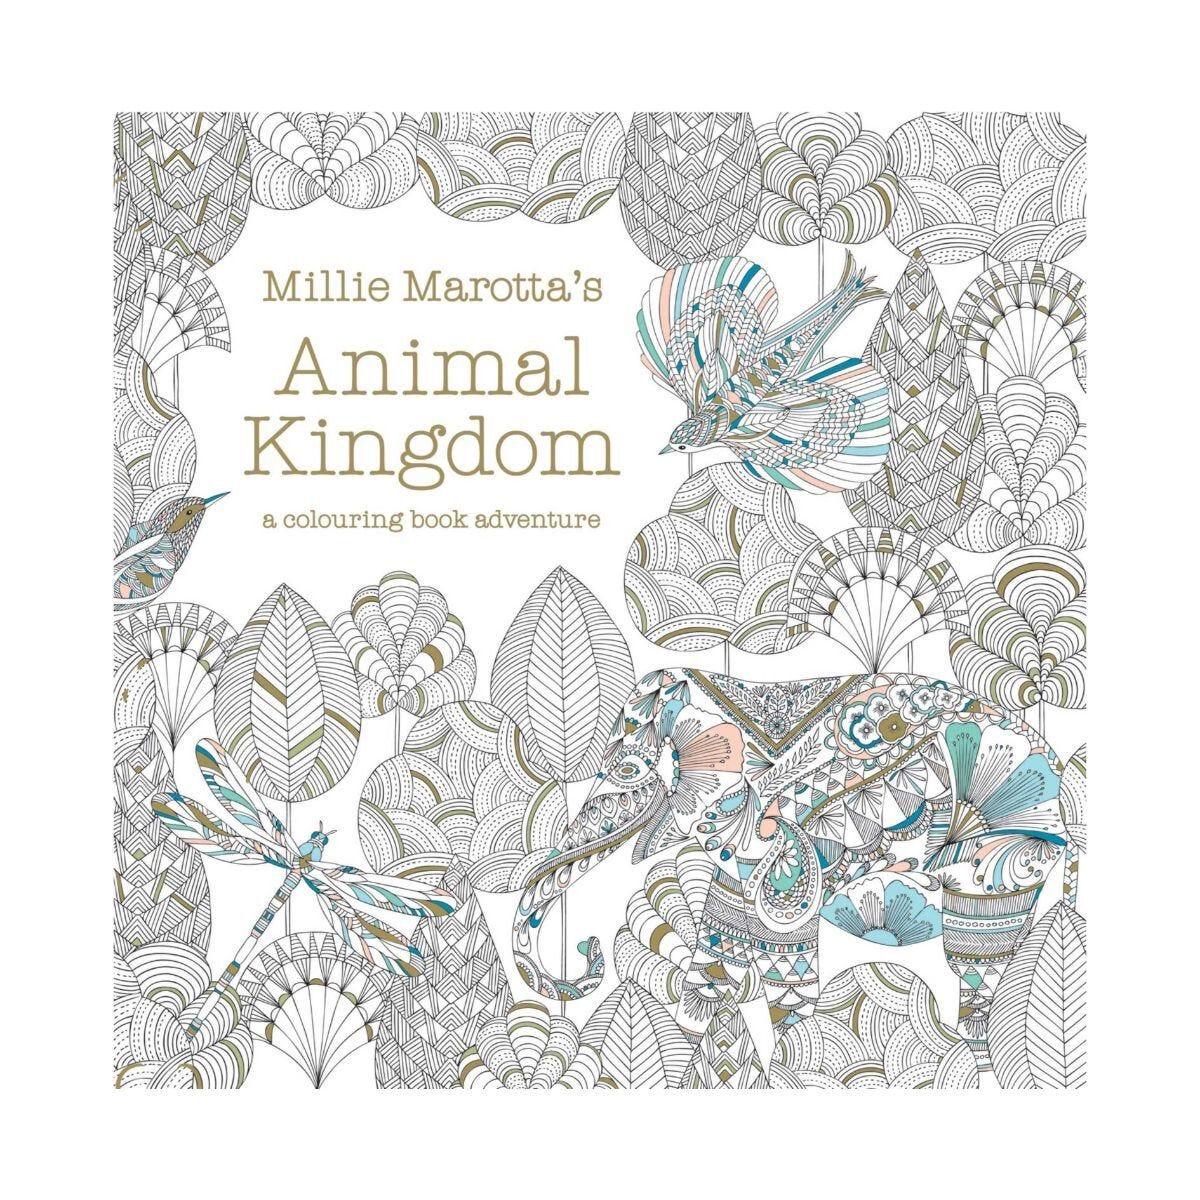 Millie Marotta's Animal Kingdom Colouring Book